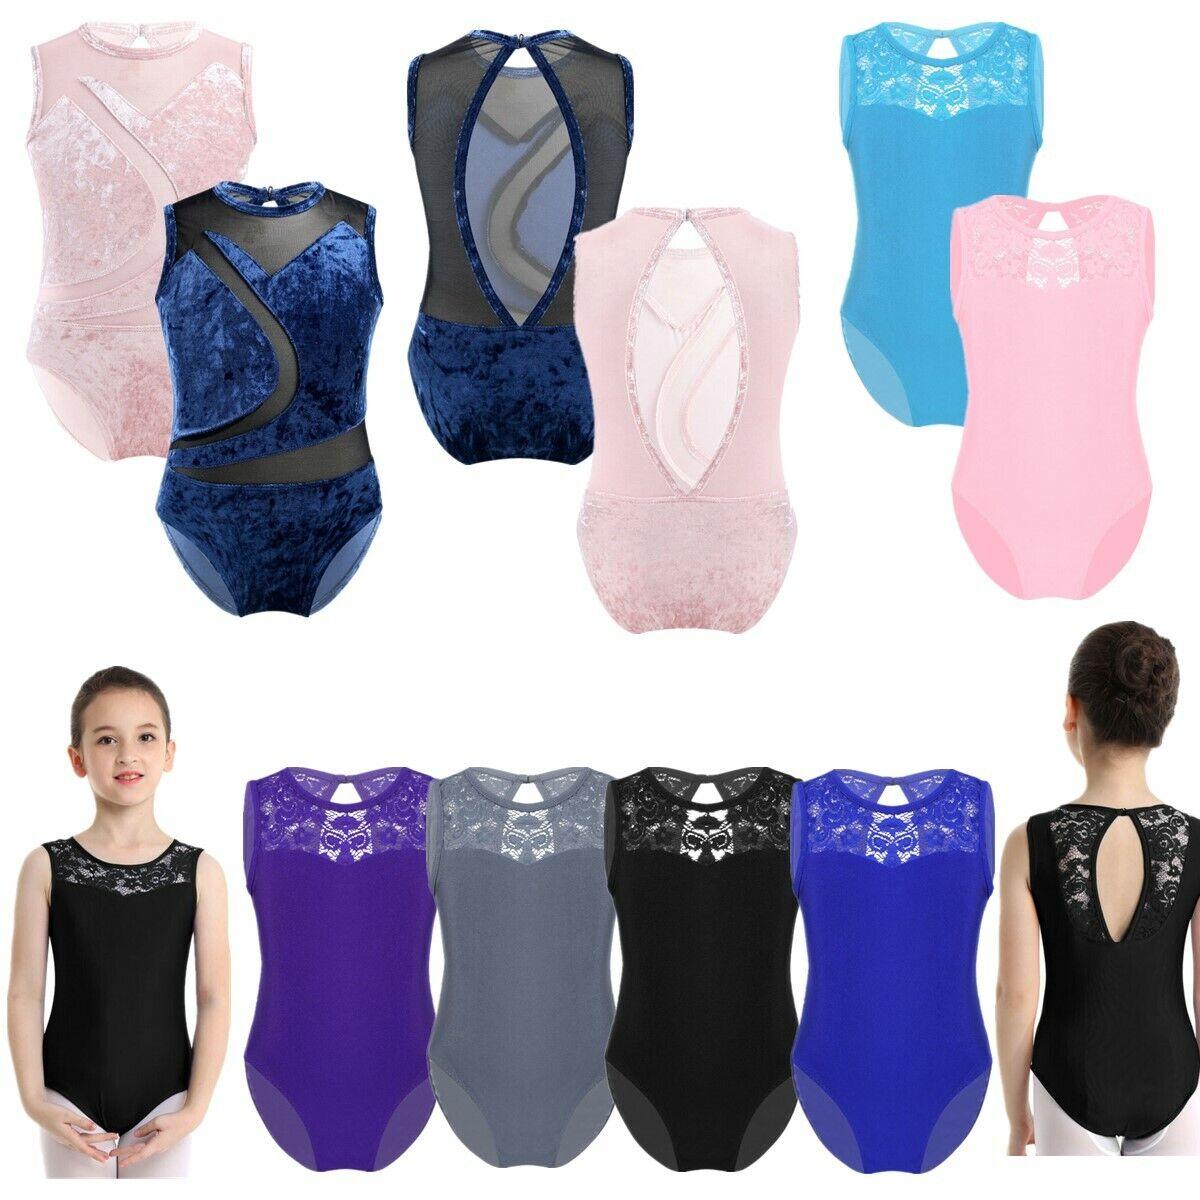 Girls Ballet Dance Gymnastics Leotard Jumpsuit Lace Splice Dancewear Tank 4-14Y